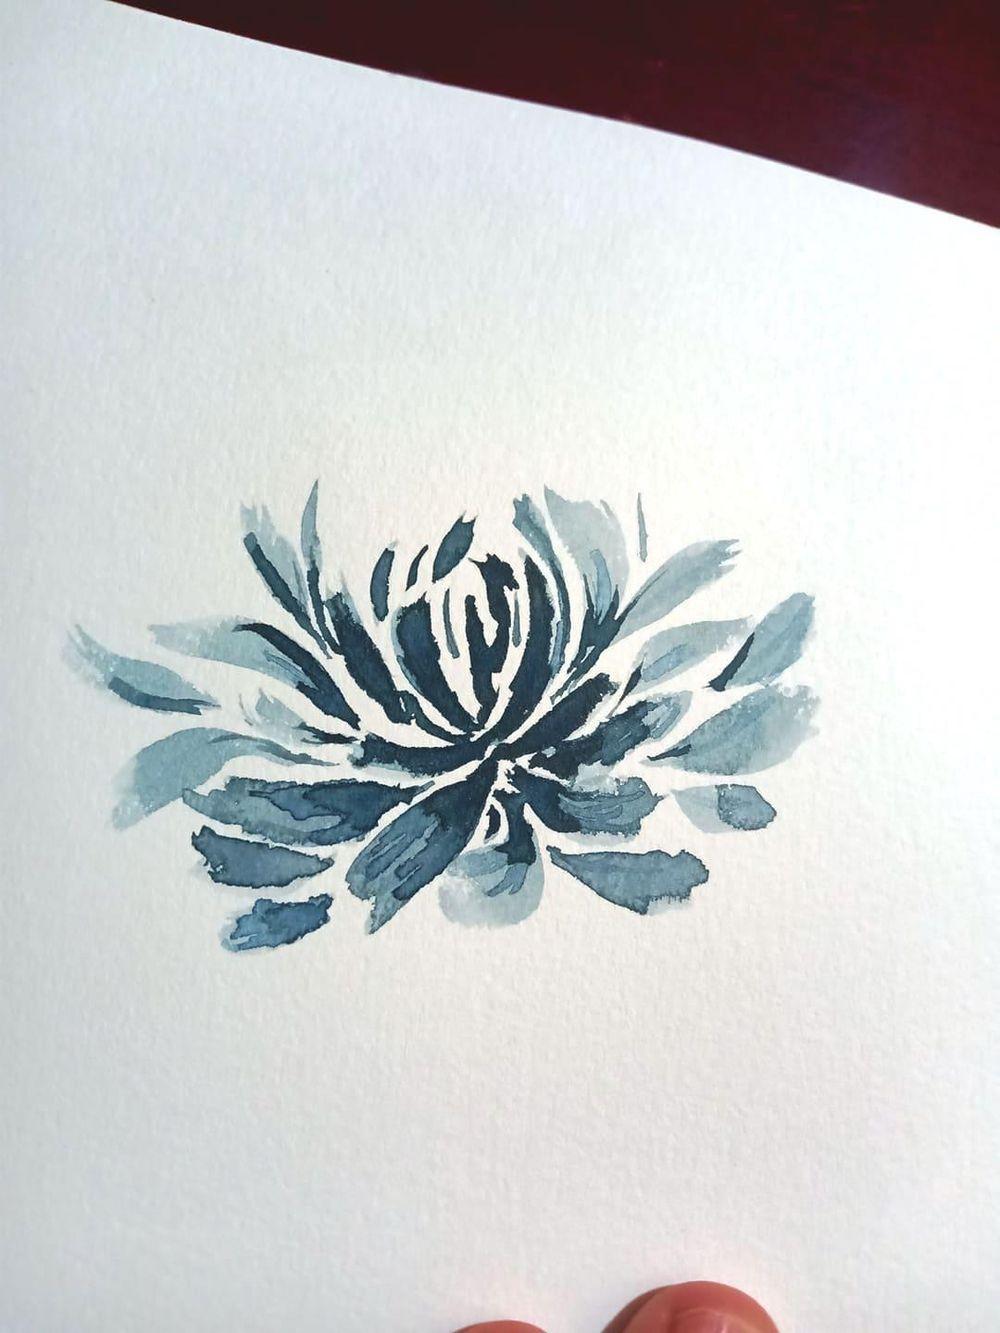 succulents - image 3 - student project